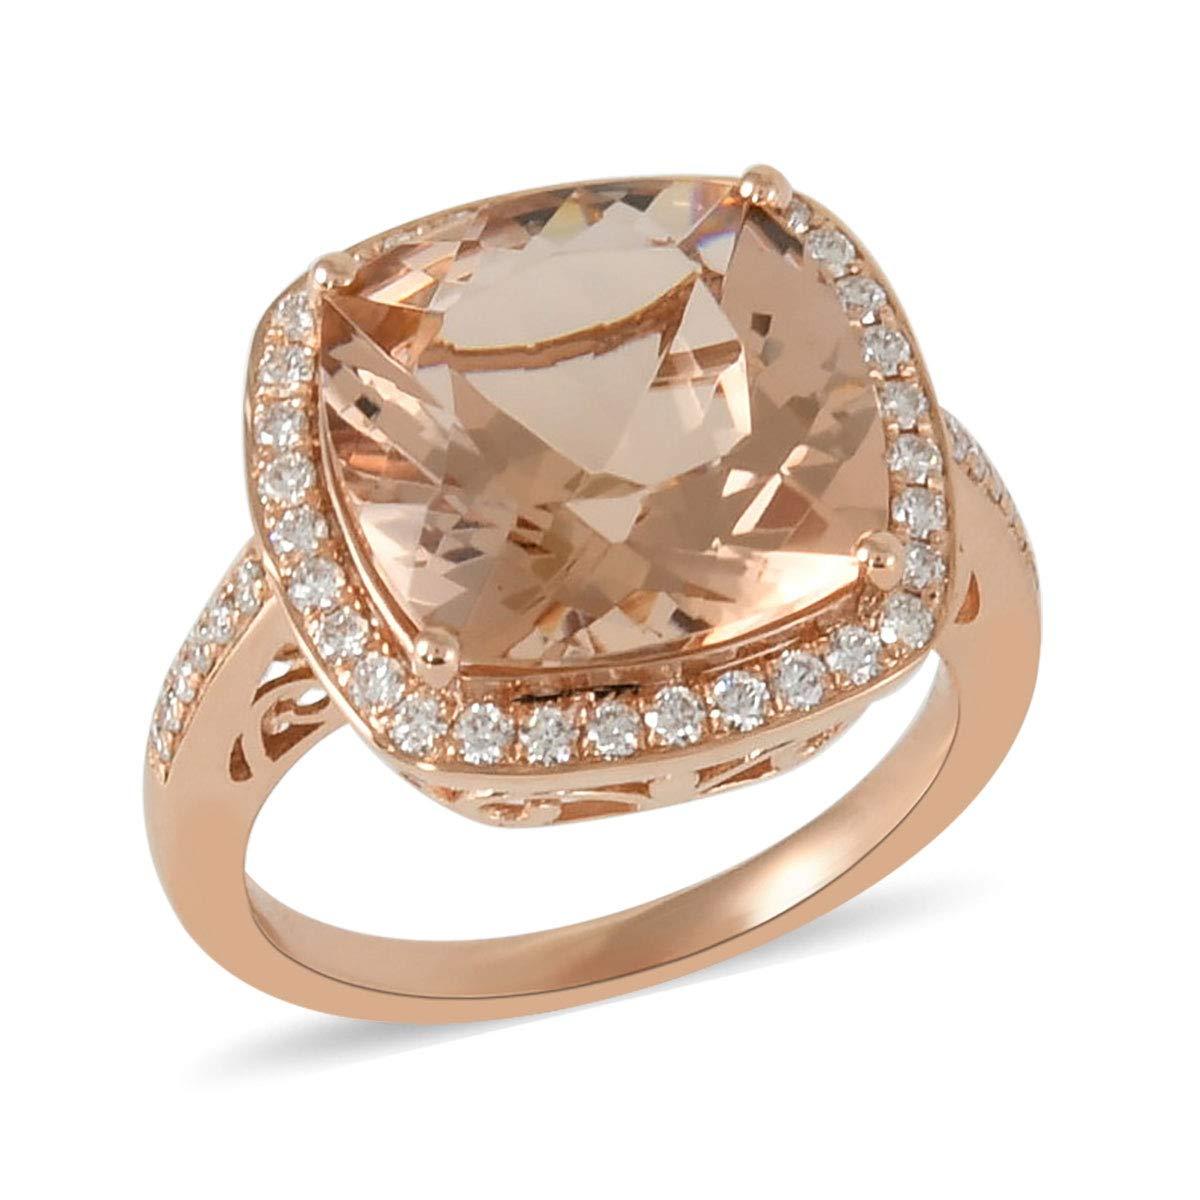 ILIANA 18K Rose Gold AAA Premium Morganite Diamond Bridal Wedding Anniversary Engagement Halo Ring Gift Jewelry for Women Ct 5.5 G-H Color SI1